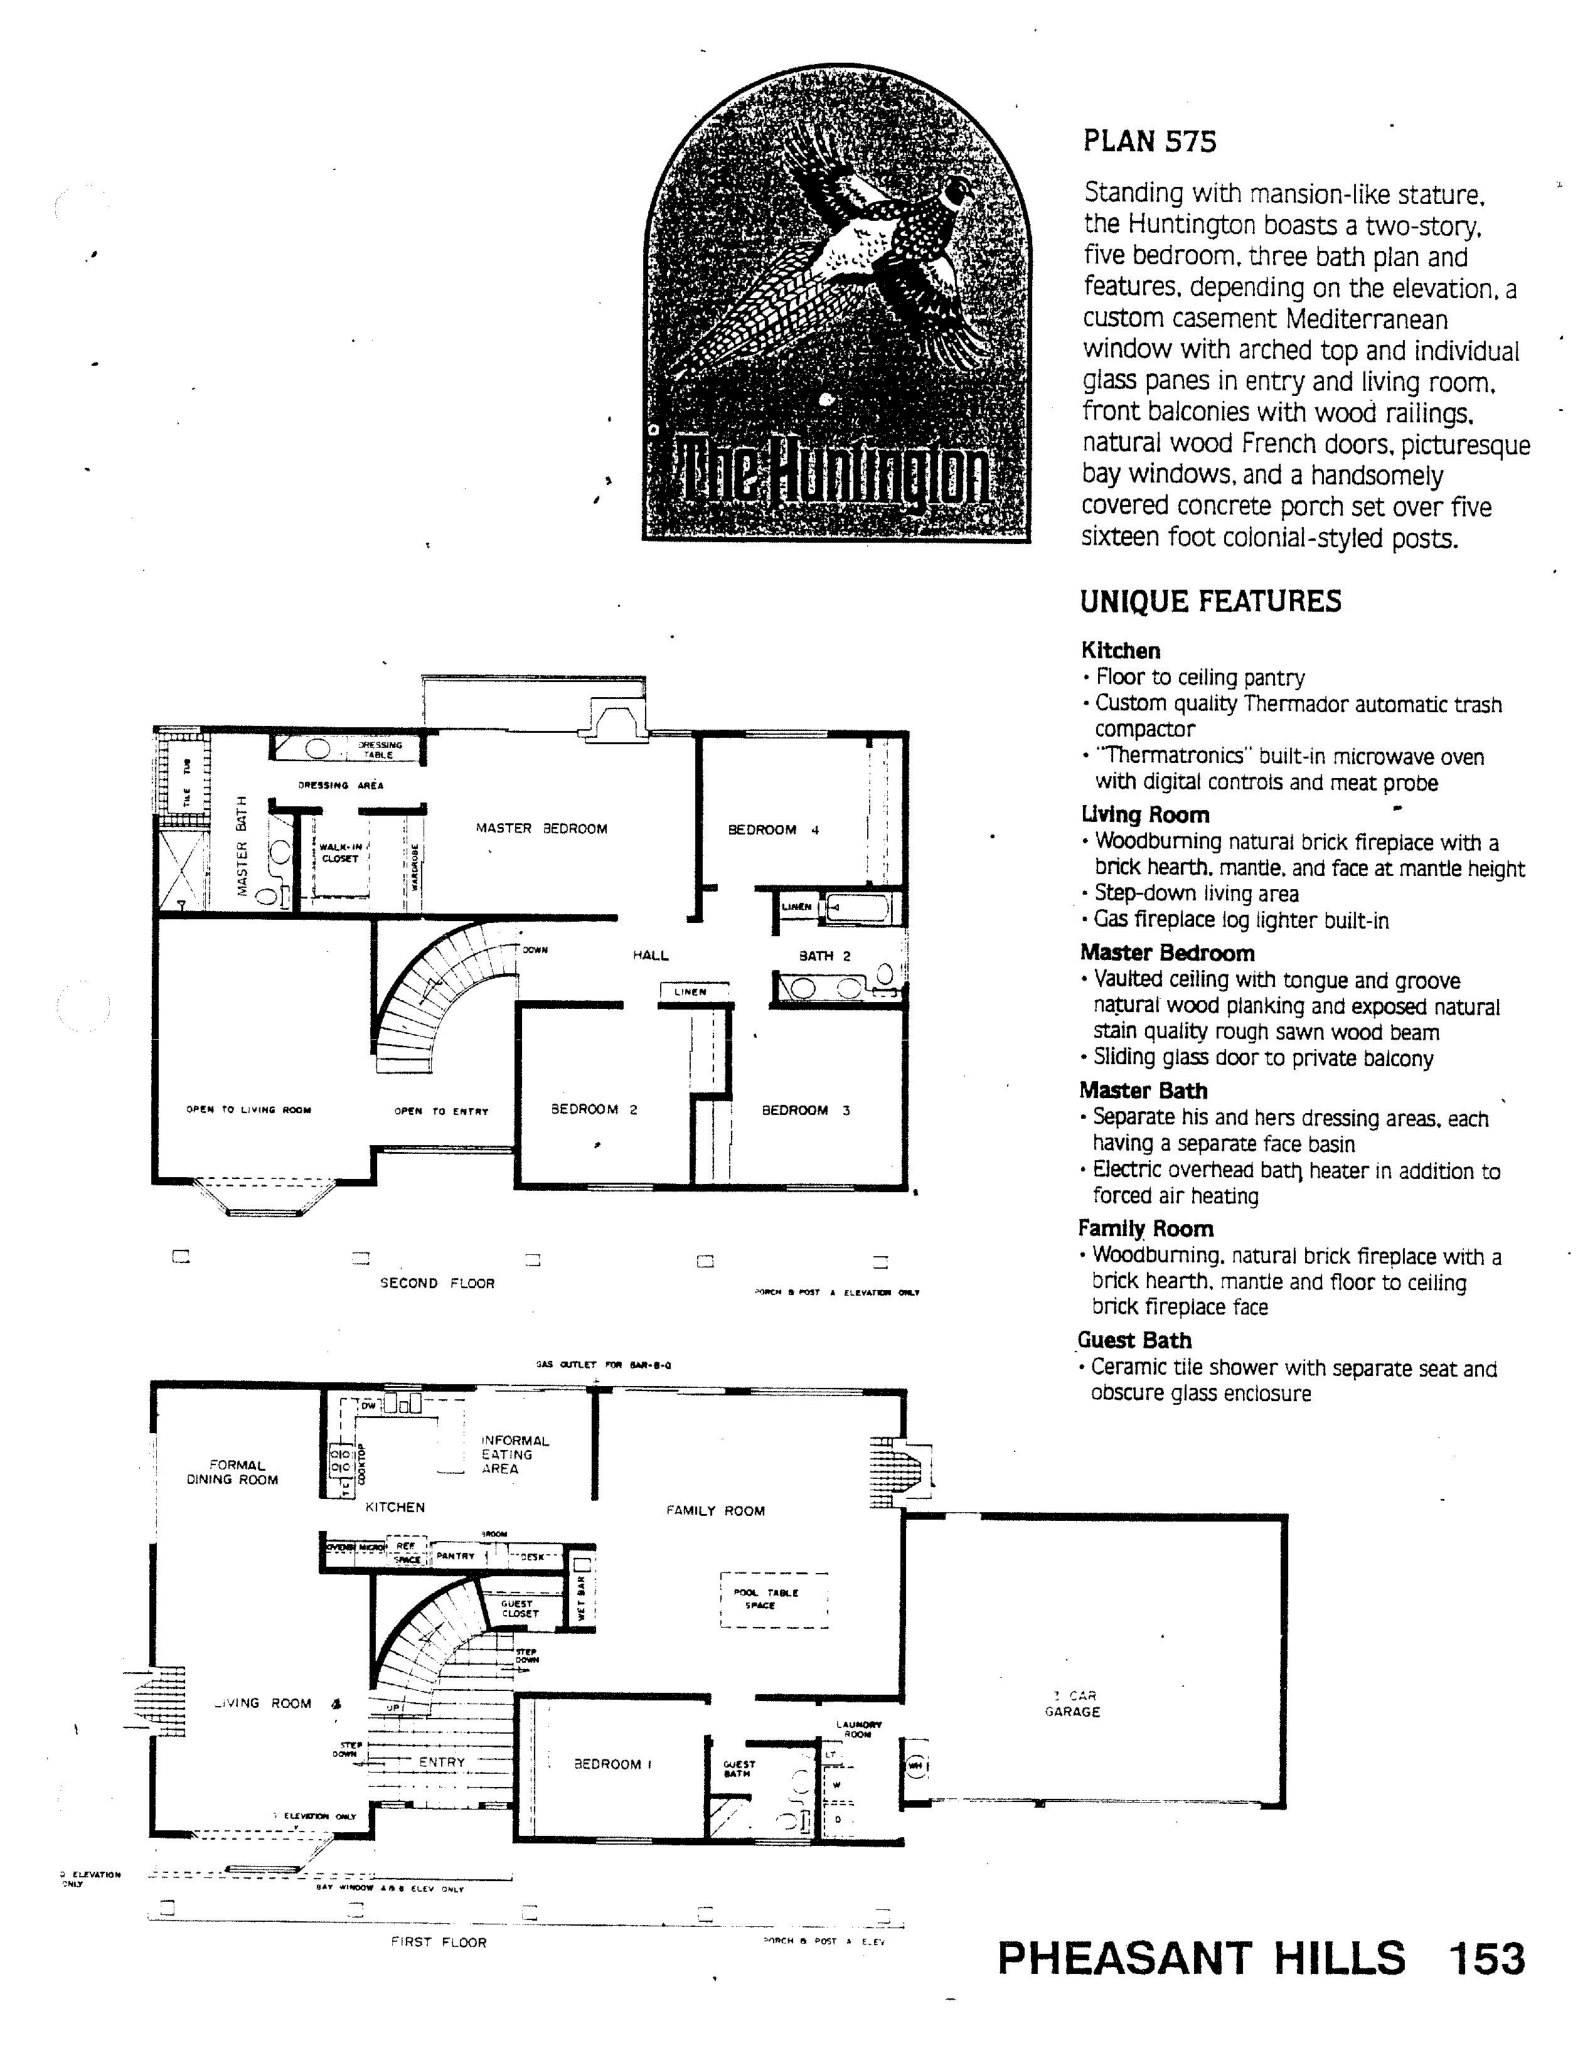 Pheasant Hills - The Huntington - Plan 575